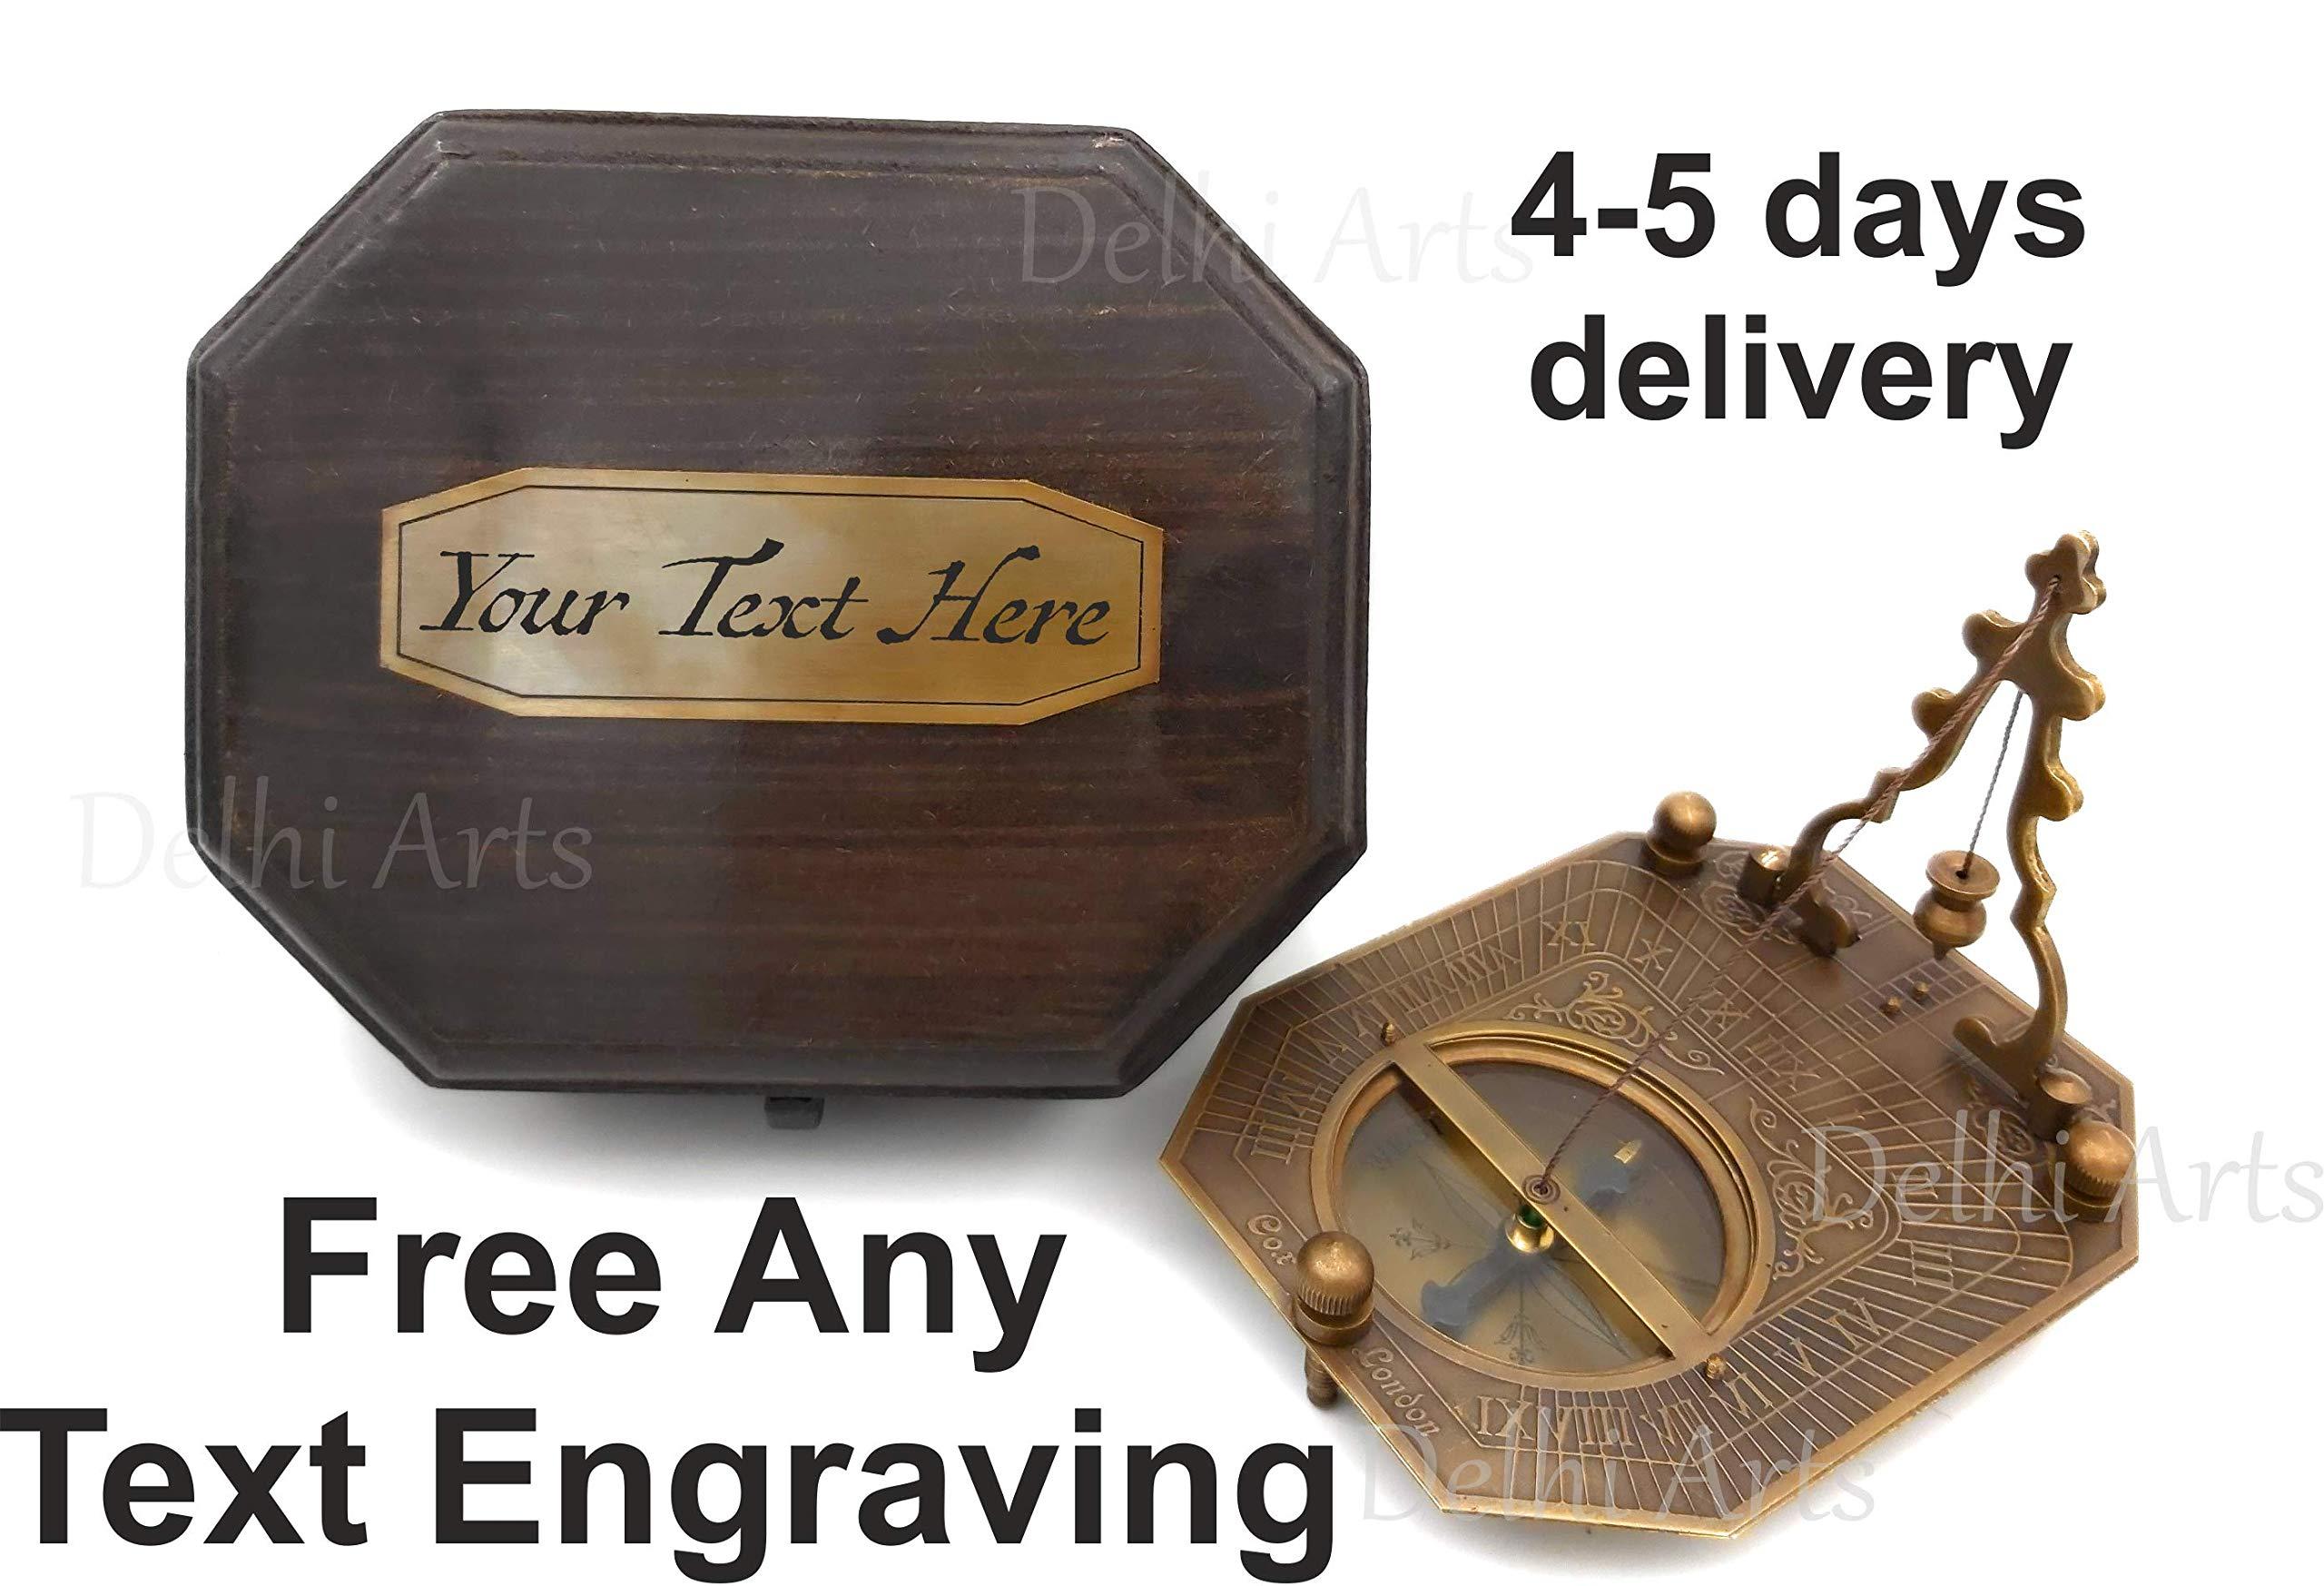 Delhi Arts Personalized Vintage Sundial, 2019, Sundial Compass with Special Engraved Greeting, Wedding Gift, Groomsmen Gift, Wedding Keepsake, Baptism, Graduation, Unusual Gift by Delhi Arts